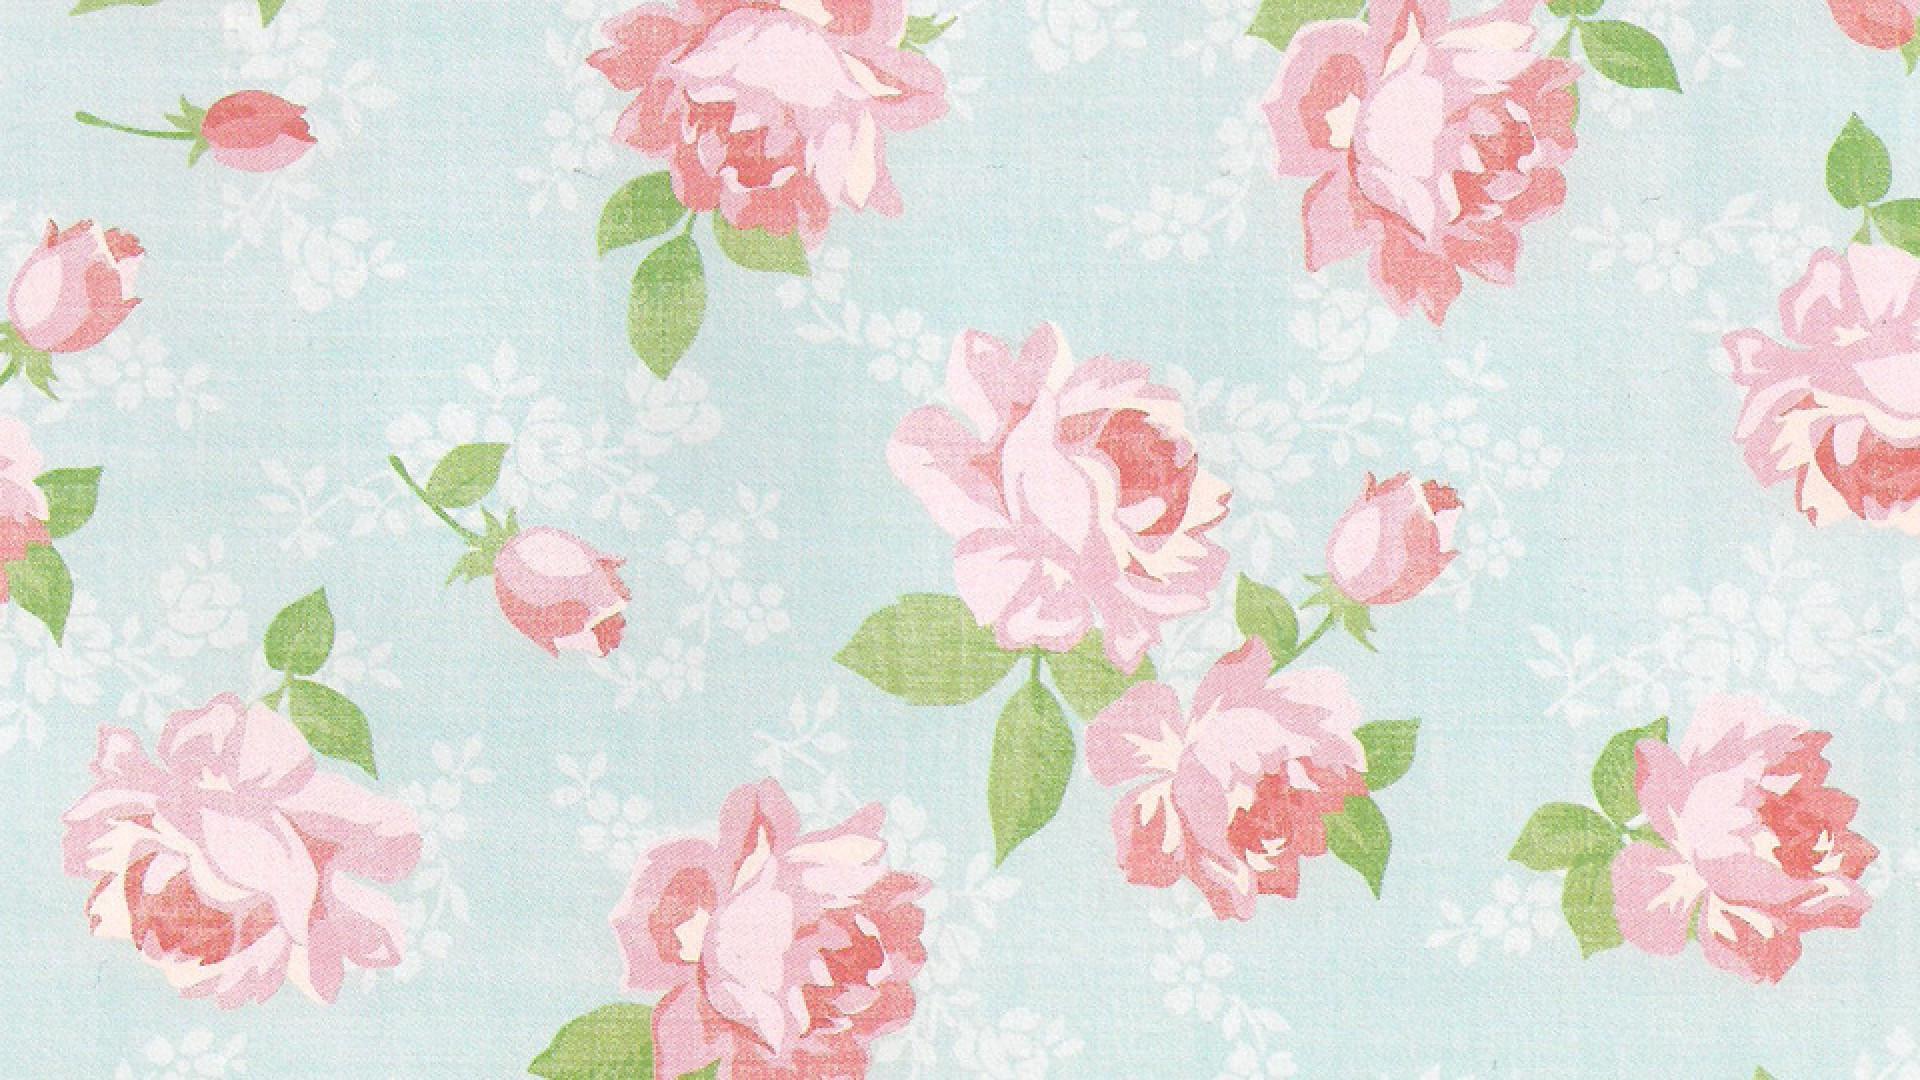 Res: 1920x1080, Flower Images Tumblr Free Download Wallpaper Wiki Avec Wallpaper 1920×1080  Tumblr Et Wallpaper Wiki Vintage Flower Background Download PIC WPD006686  87 ...